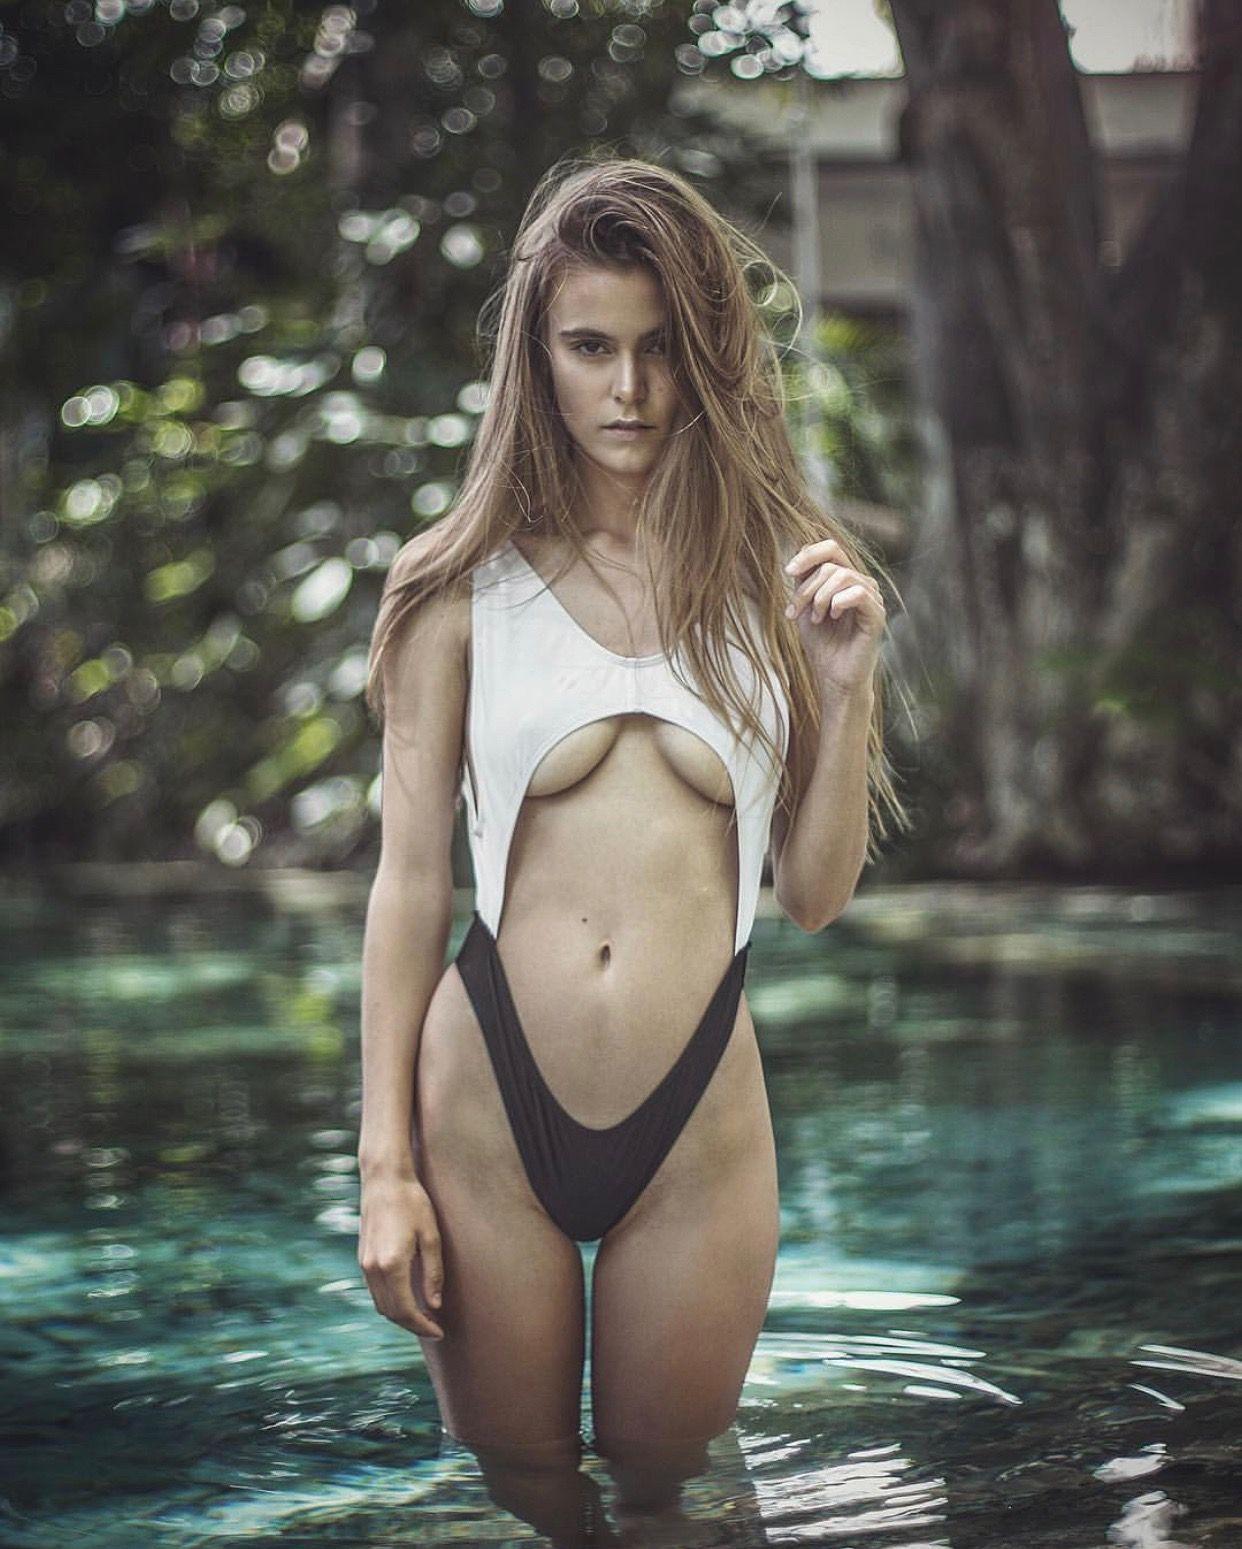 2019 Amberleigh West nude photos 2019